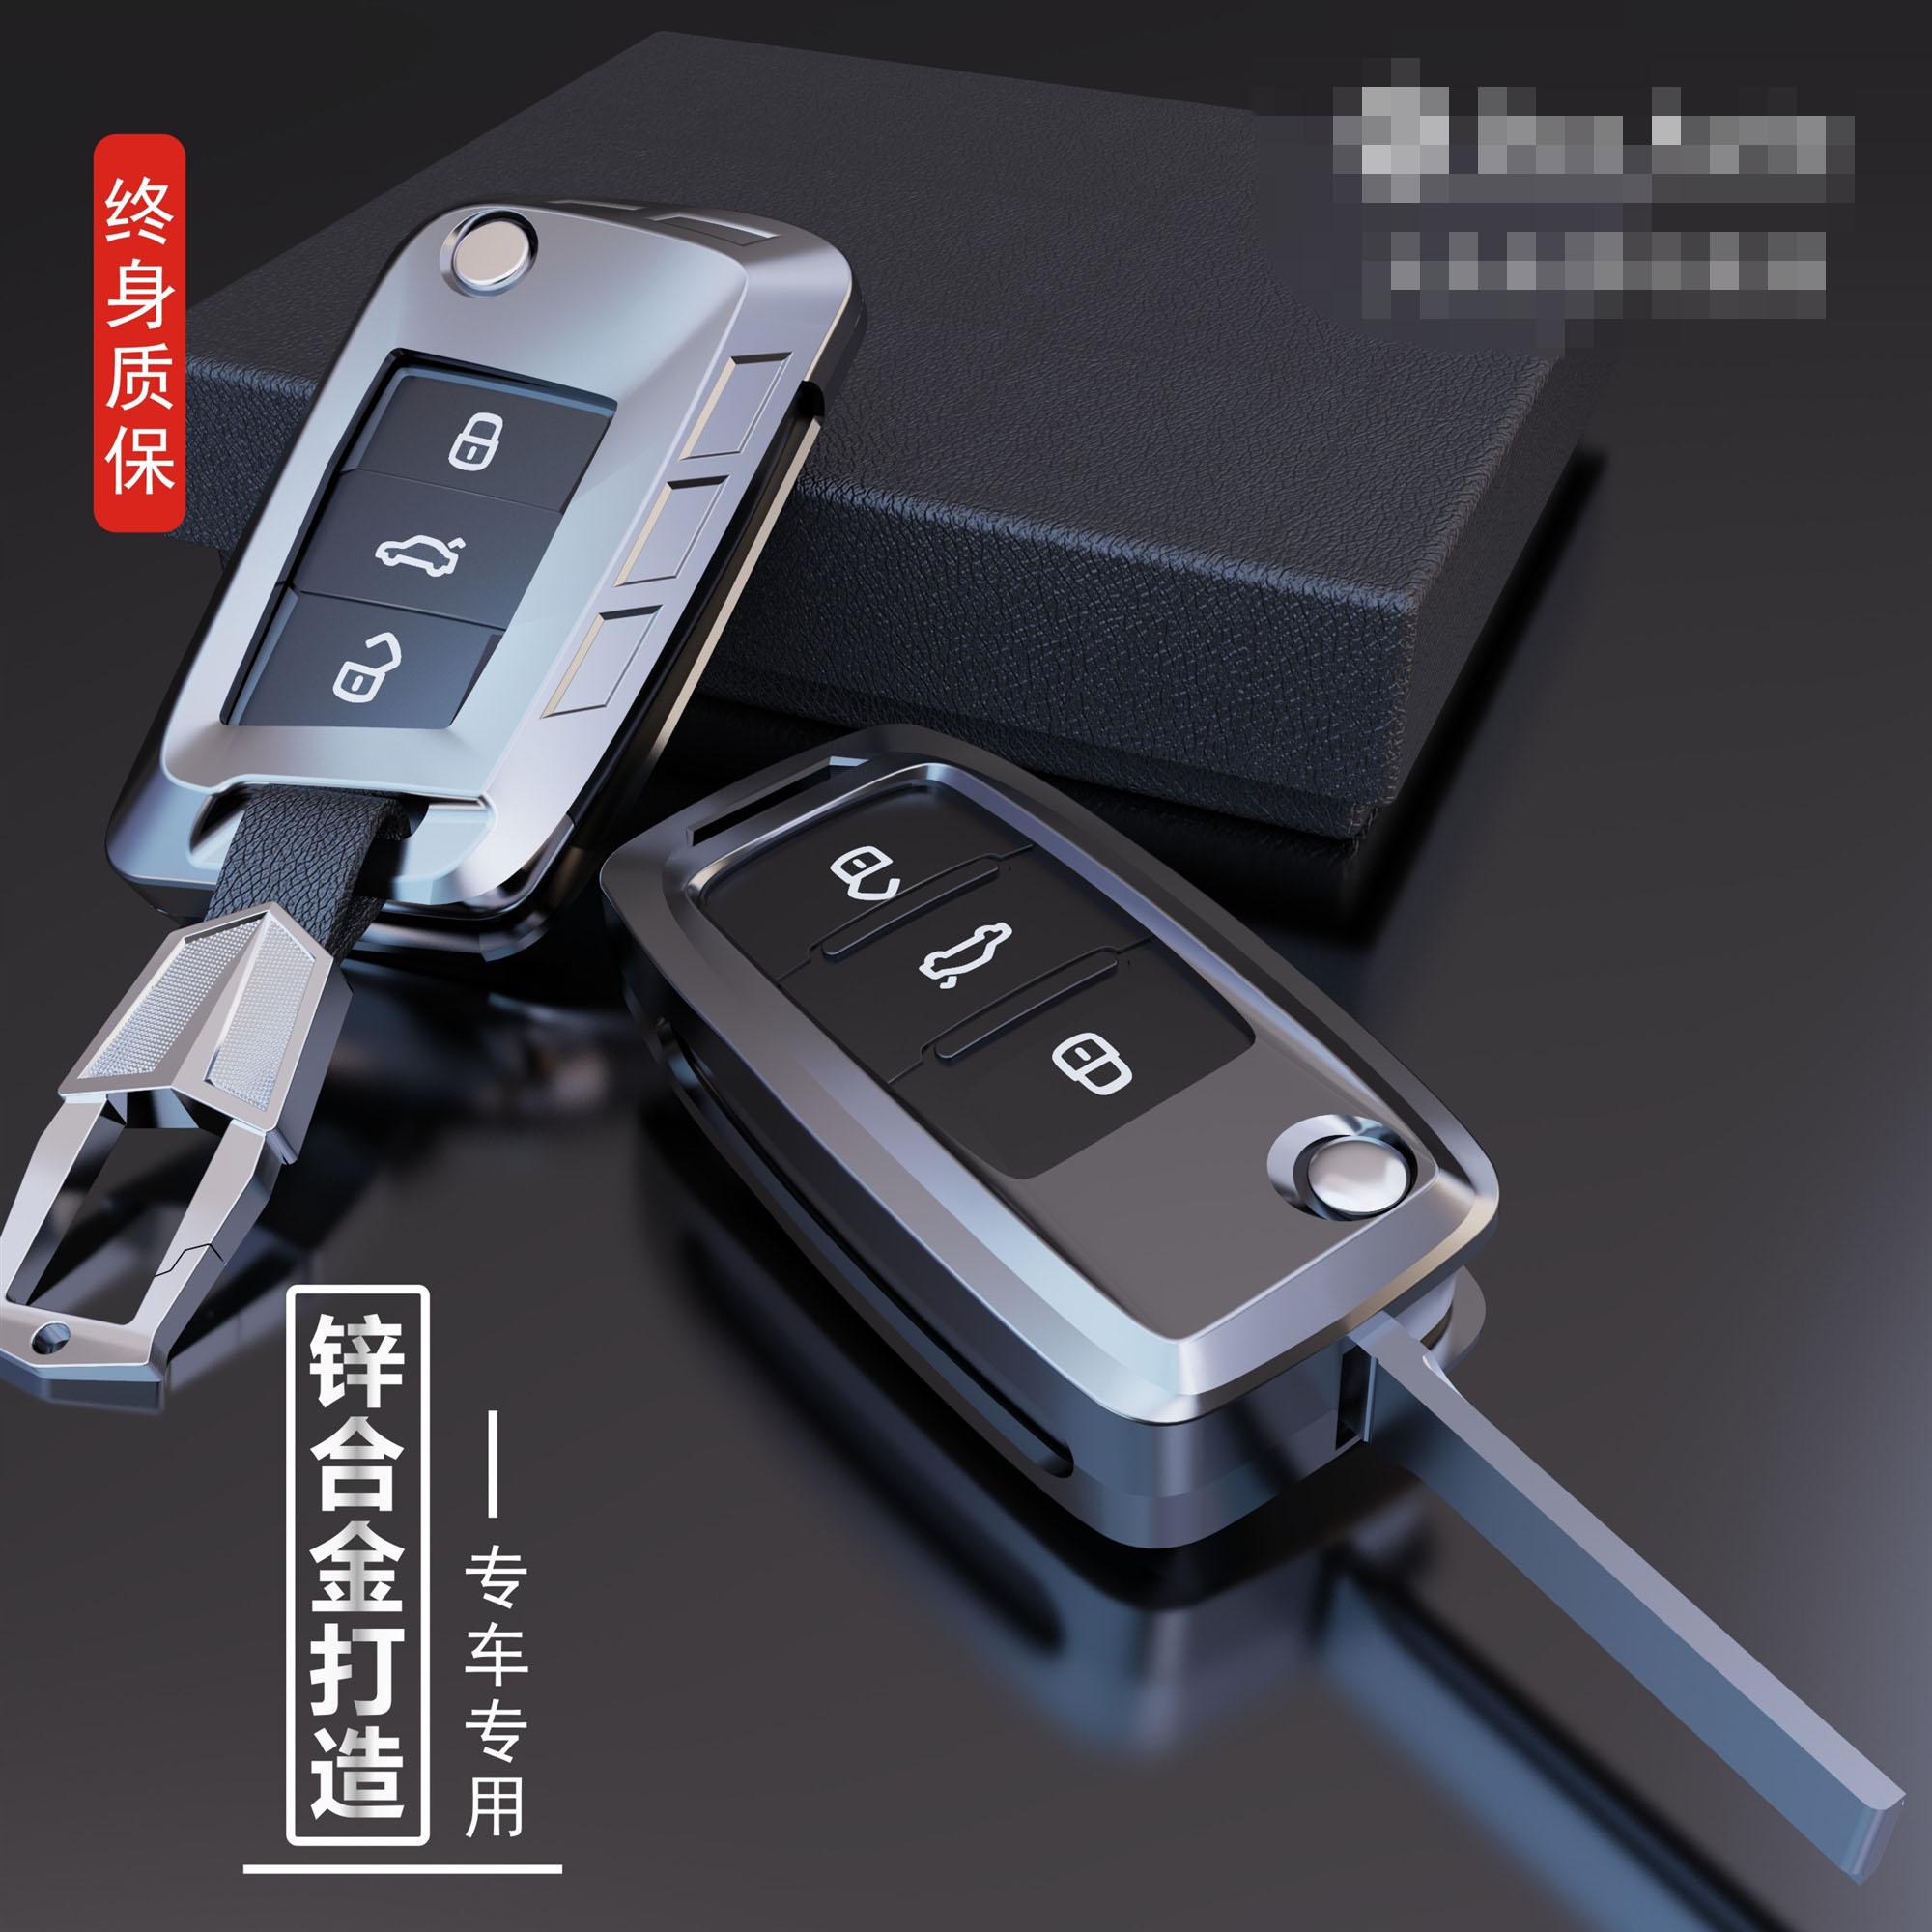 Znic Alloy Car Remote Key Case Cover Holder Shell Fob For Volkswagen For VW For agotan For Passat  B8 Golf For Skoda Superb A7